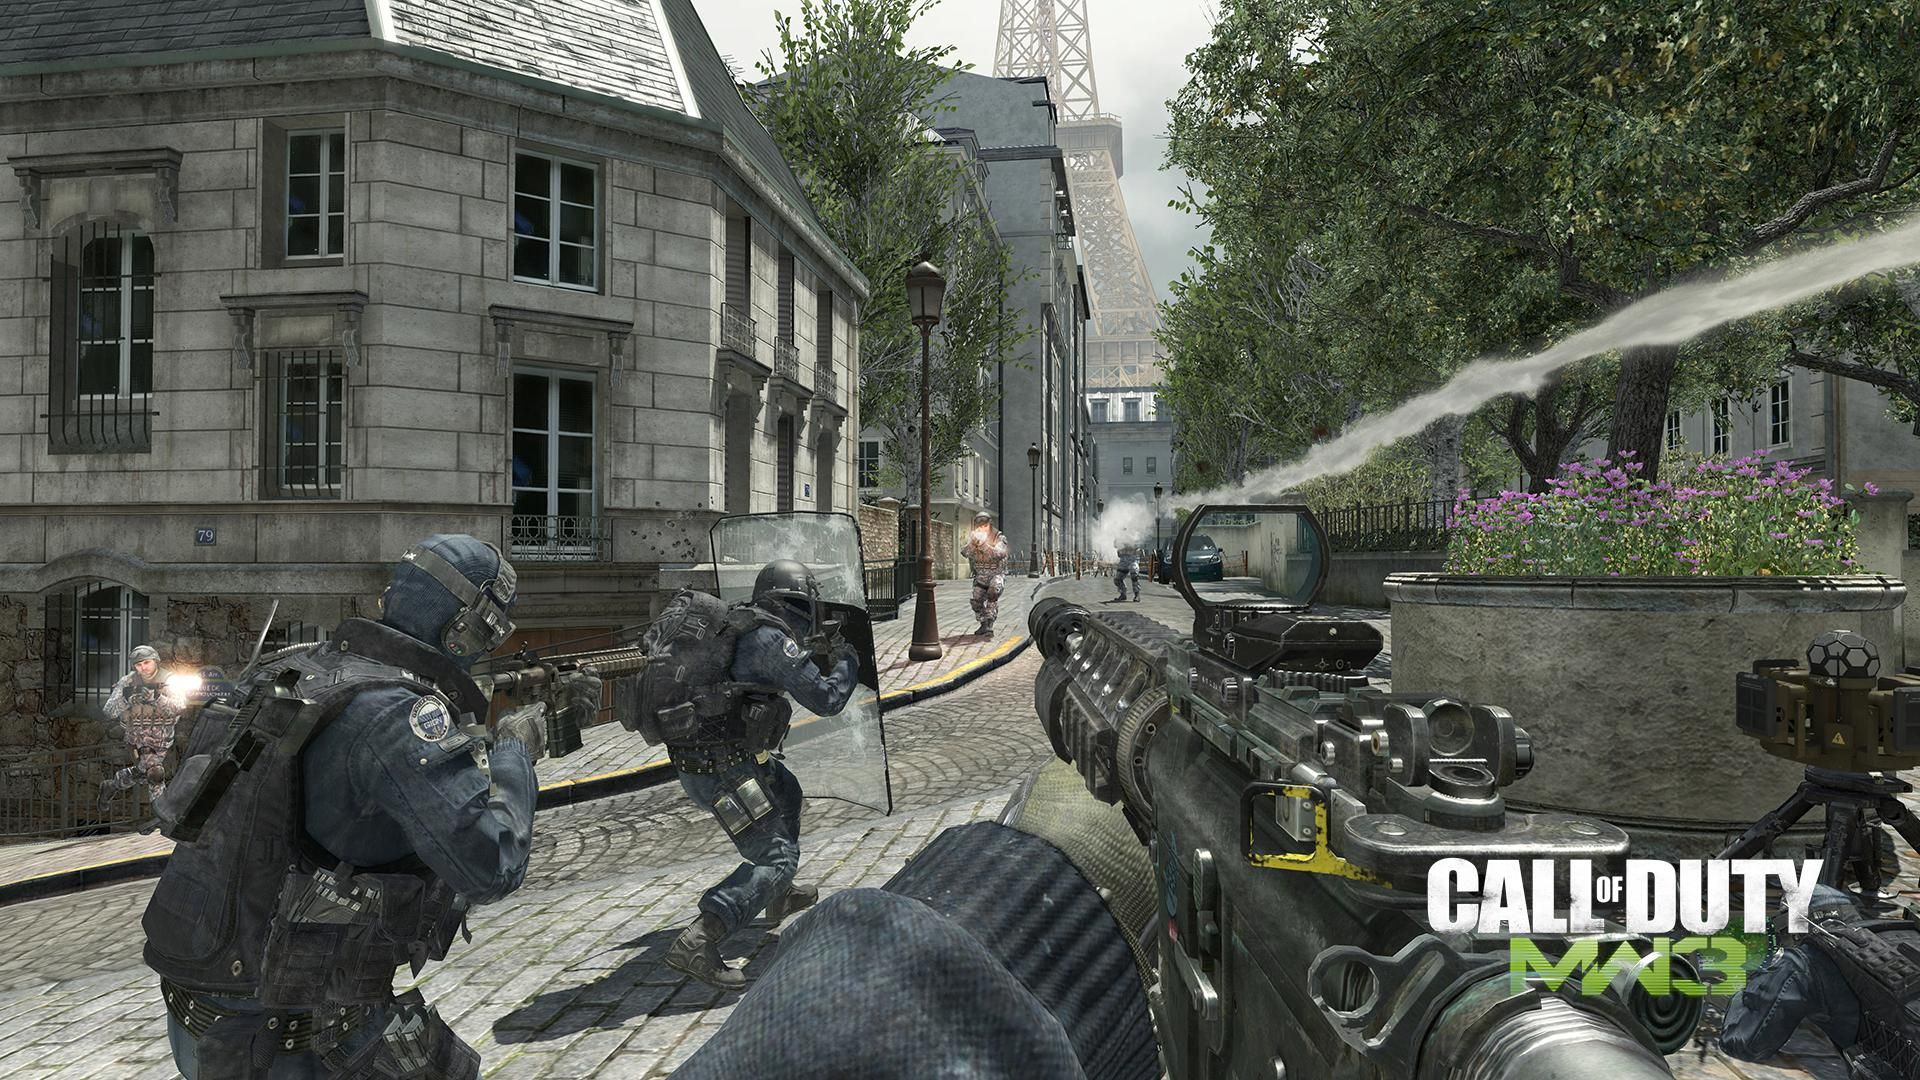 Skachat X Call Of Duty Modern Warfare Soldat Avtomat Modern Warfare Call Of Duty Call Of Duty Infinite